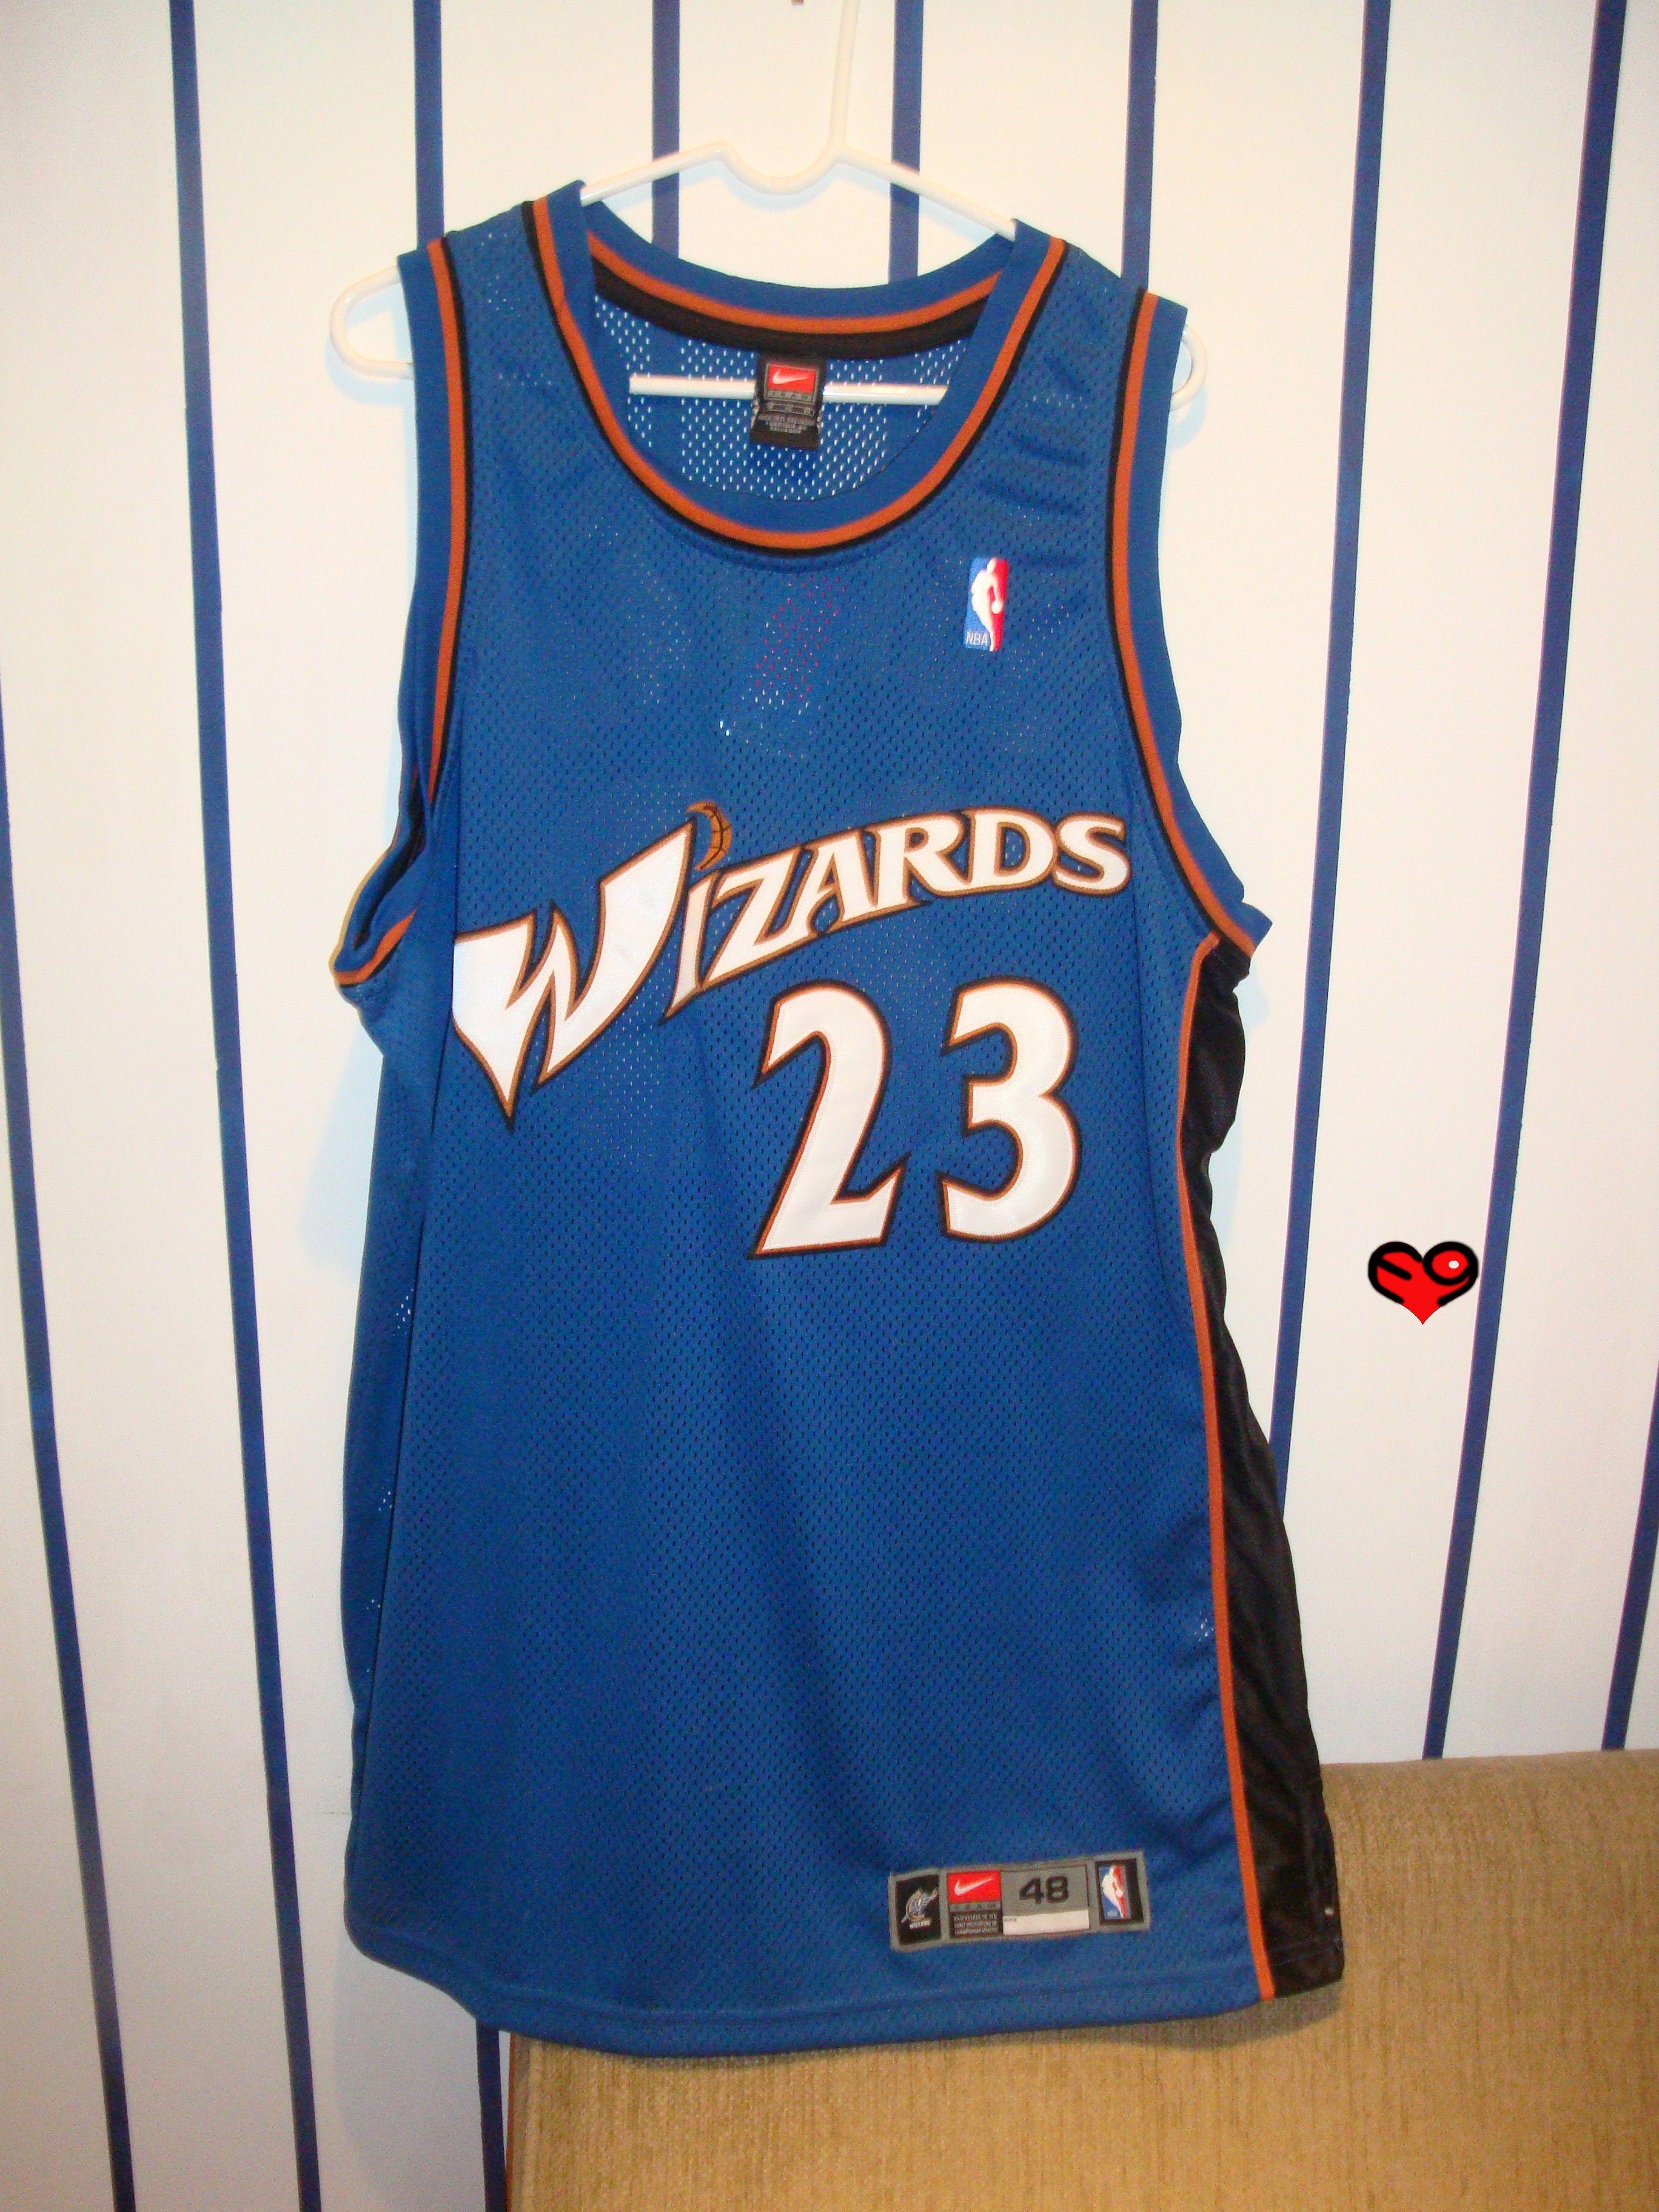 oihawf Jordan Authentic Nike Wizards Away Jersey (front) | Michael Jordan